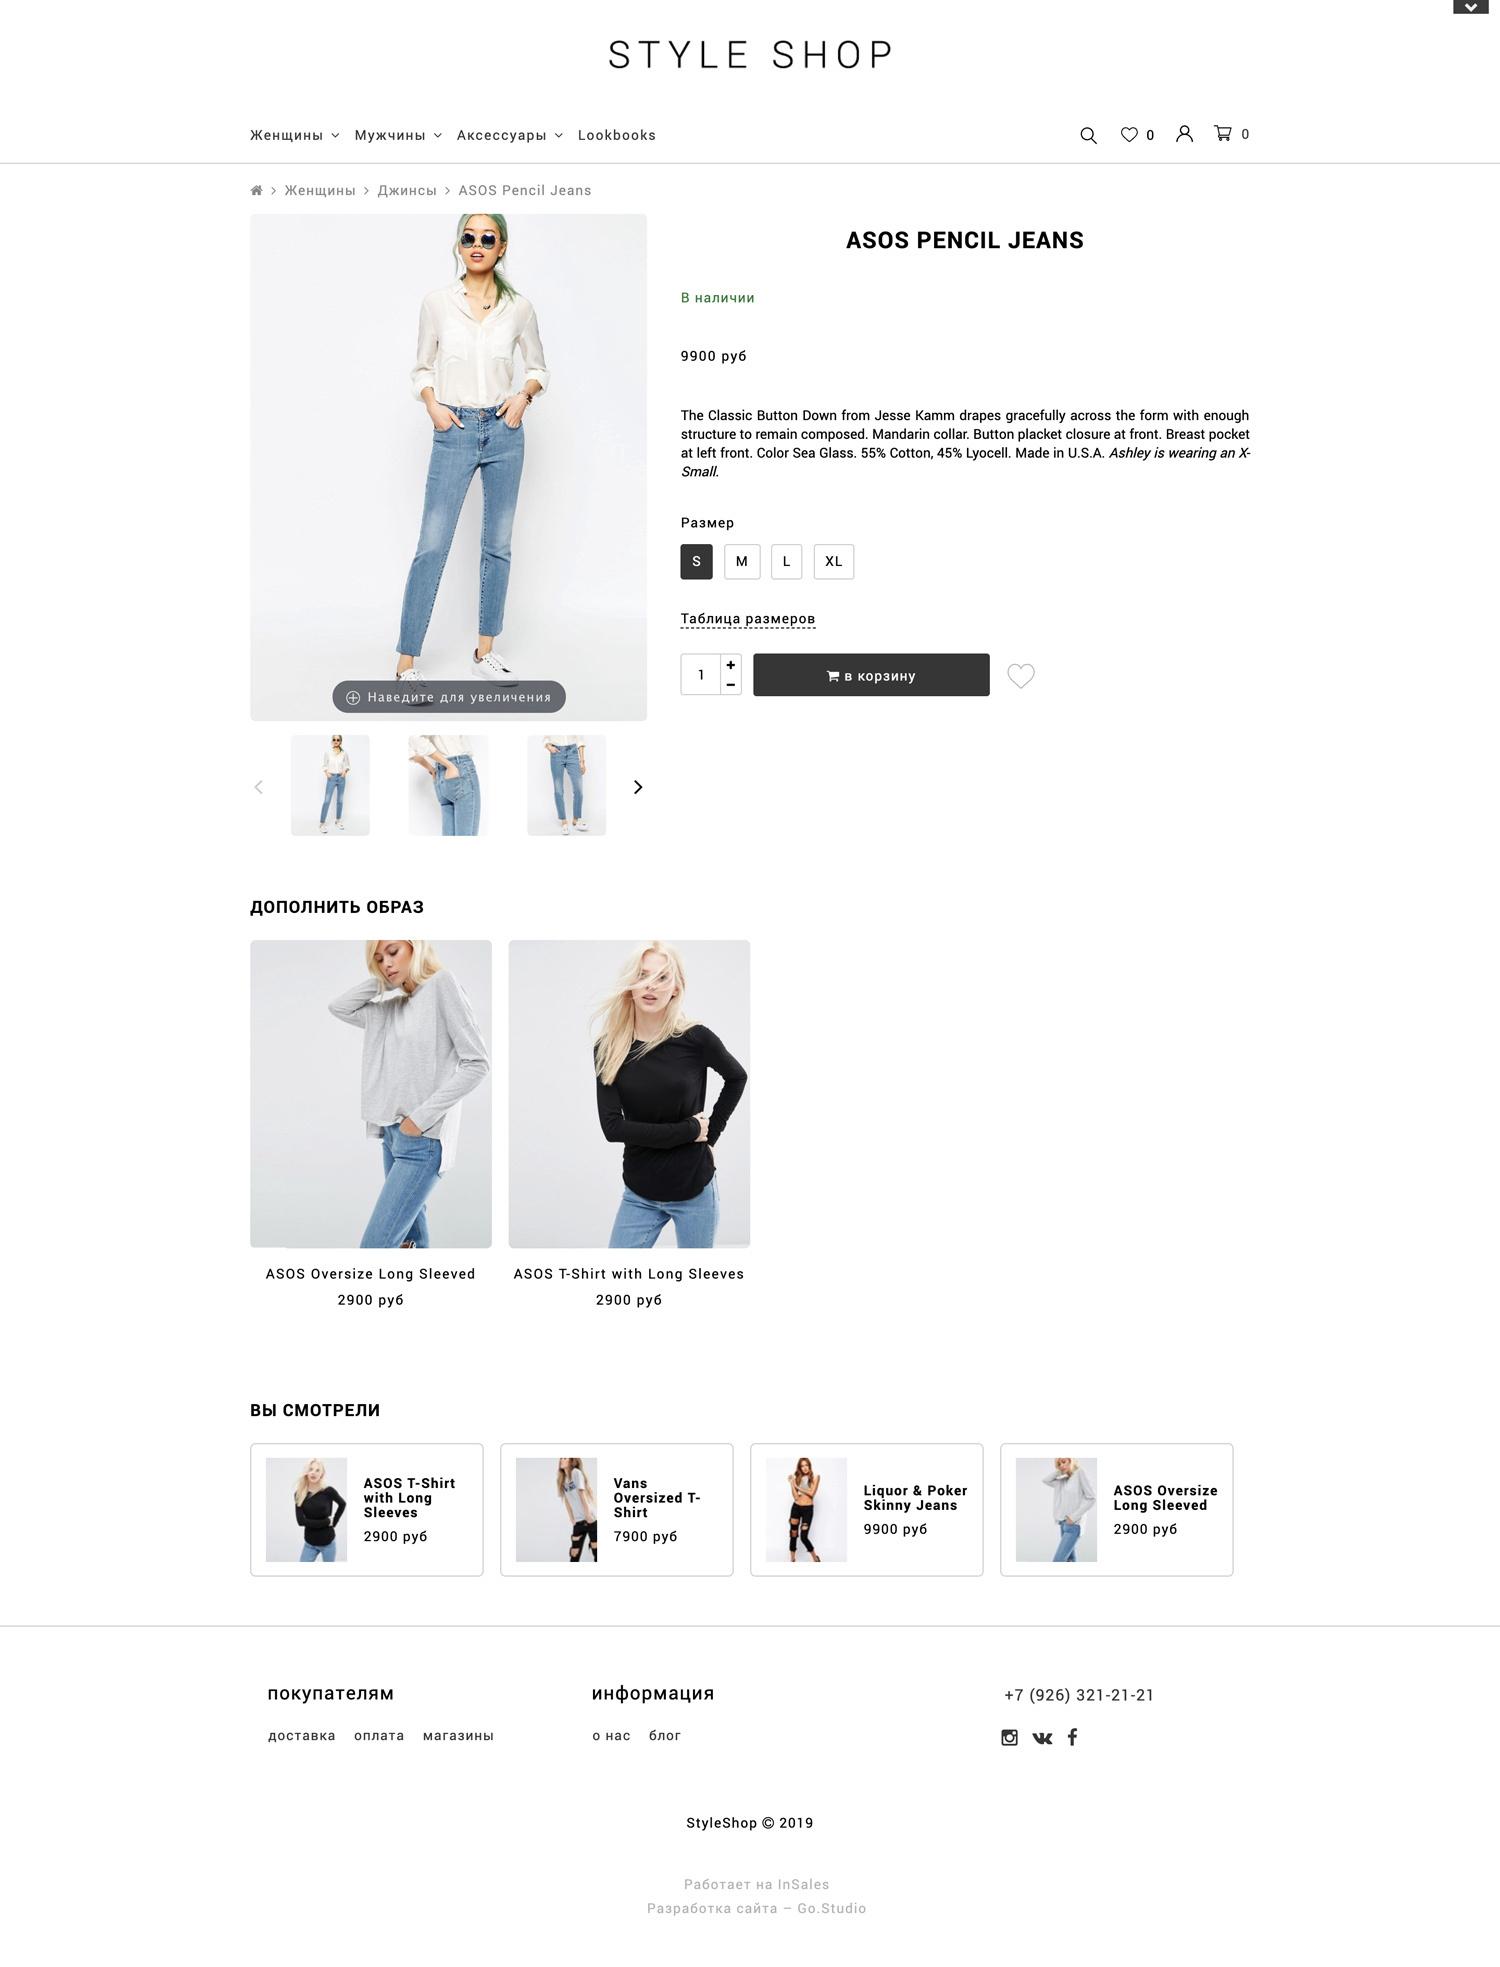 Шаблон интернет магазина - Styleshop